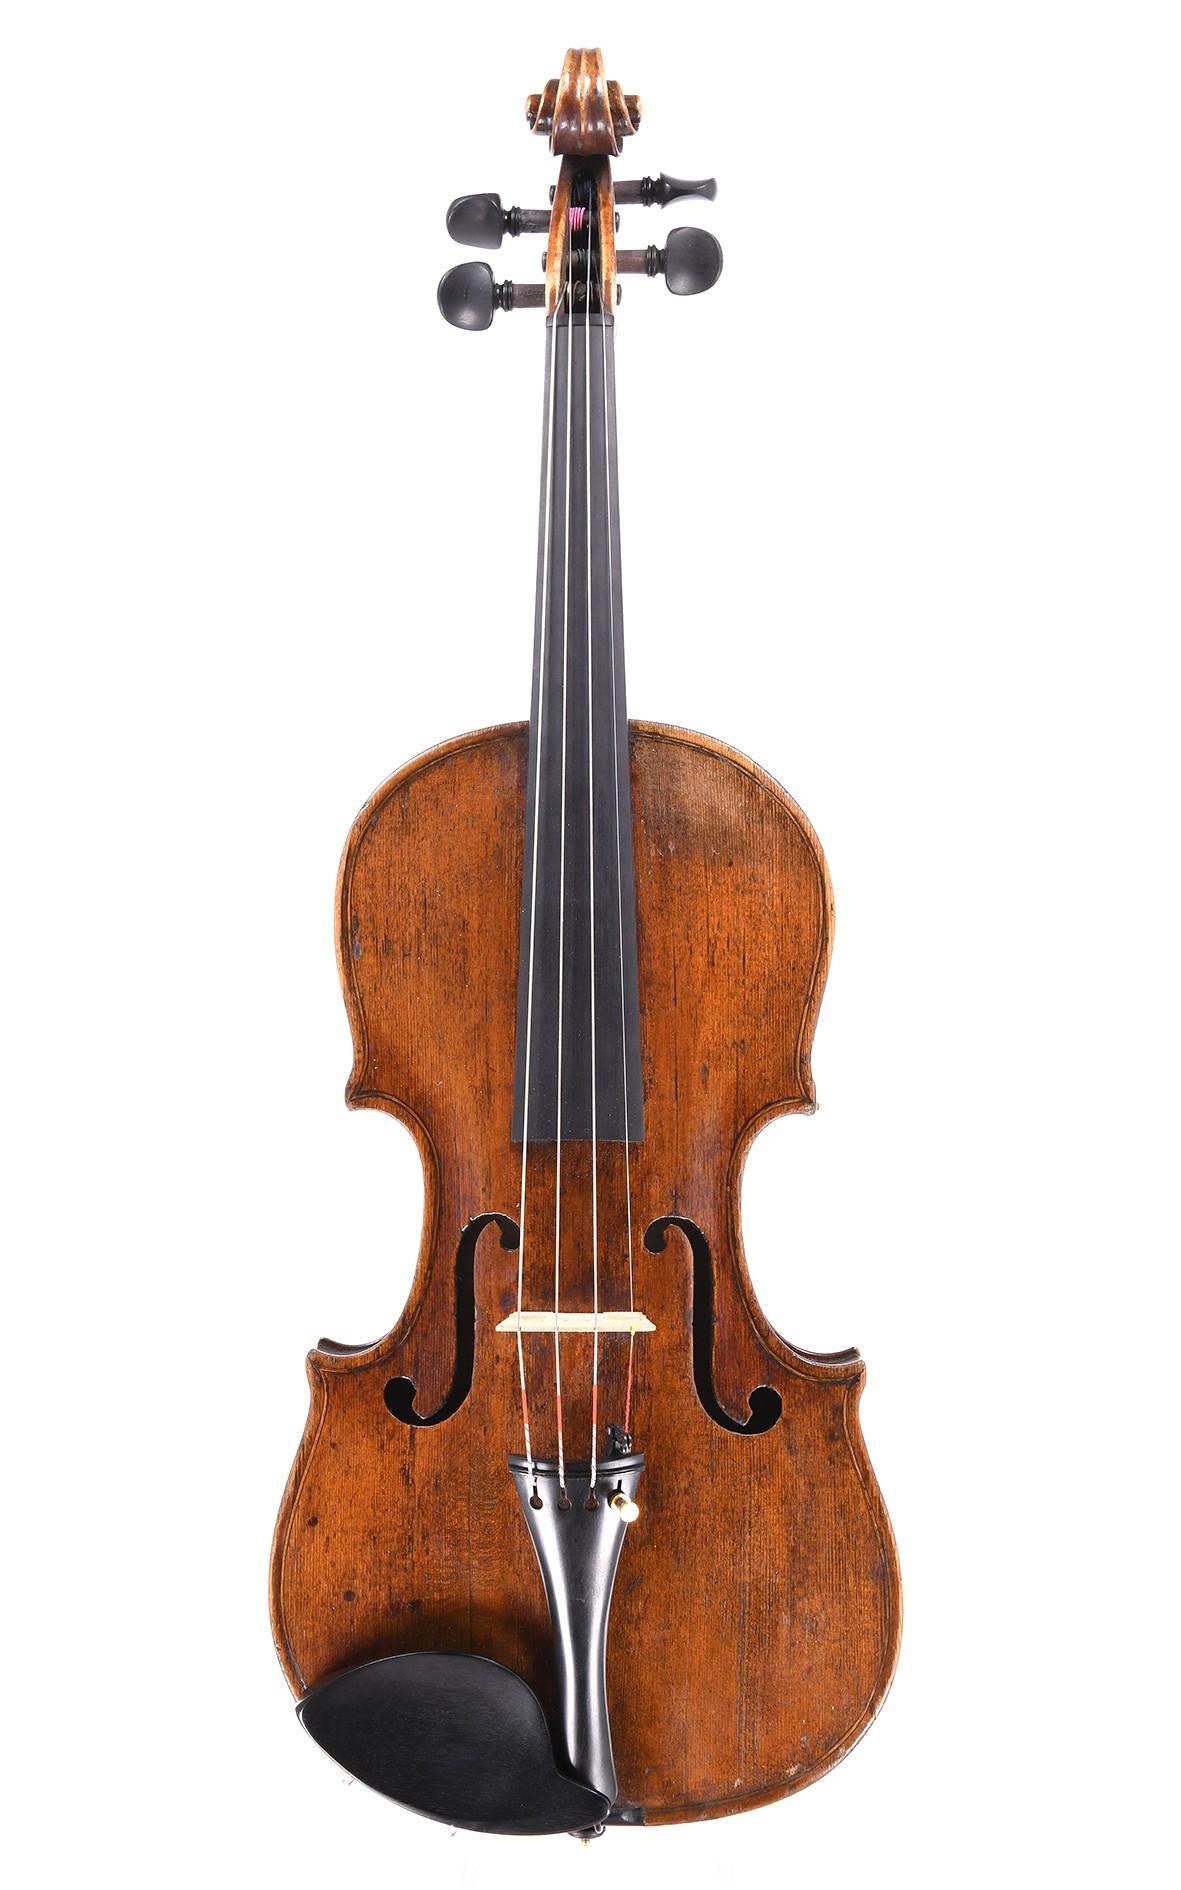 Interesting master violin, 18th century probably Flemish